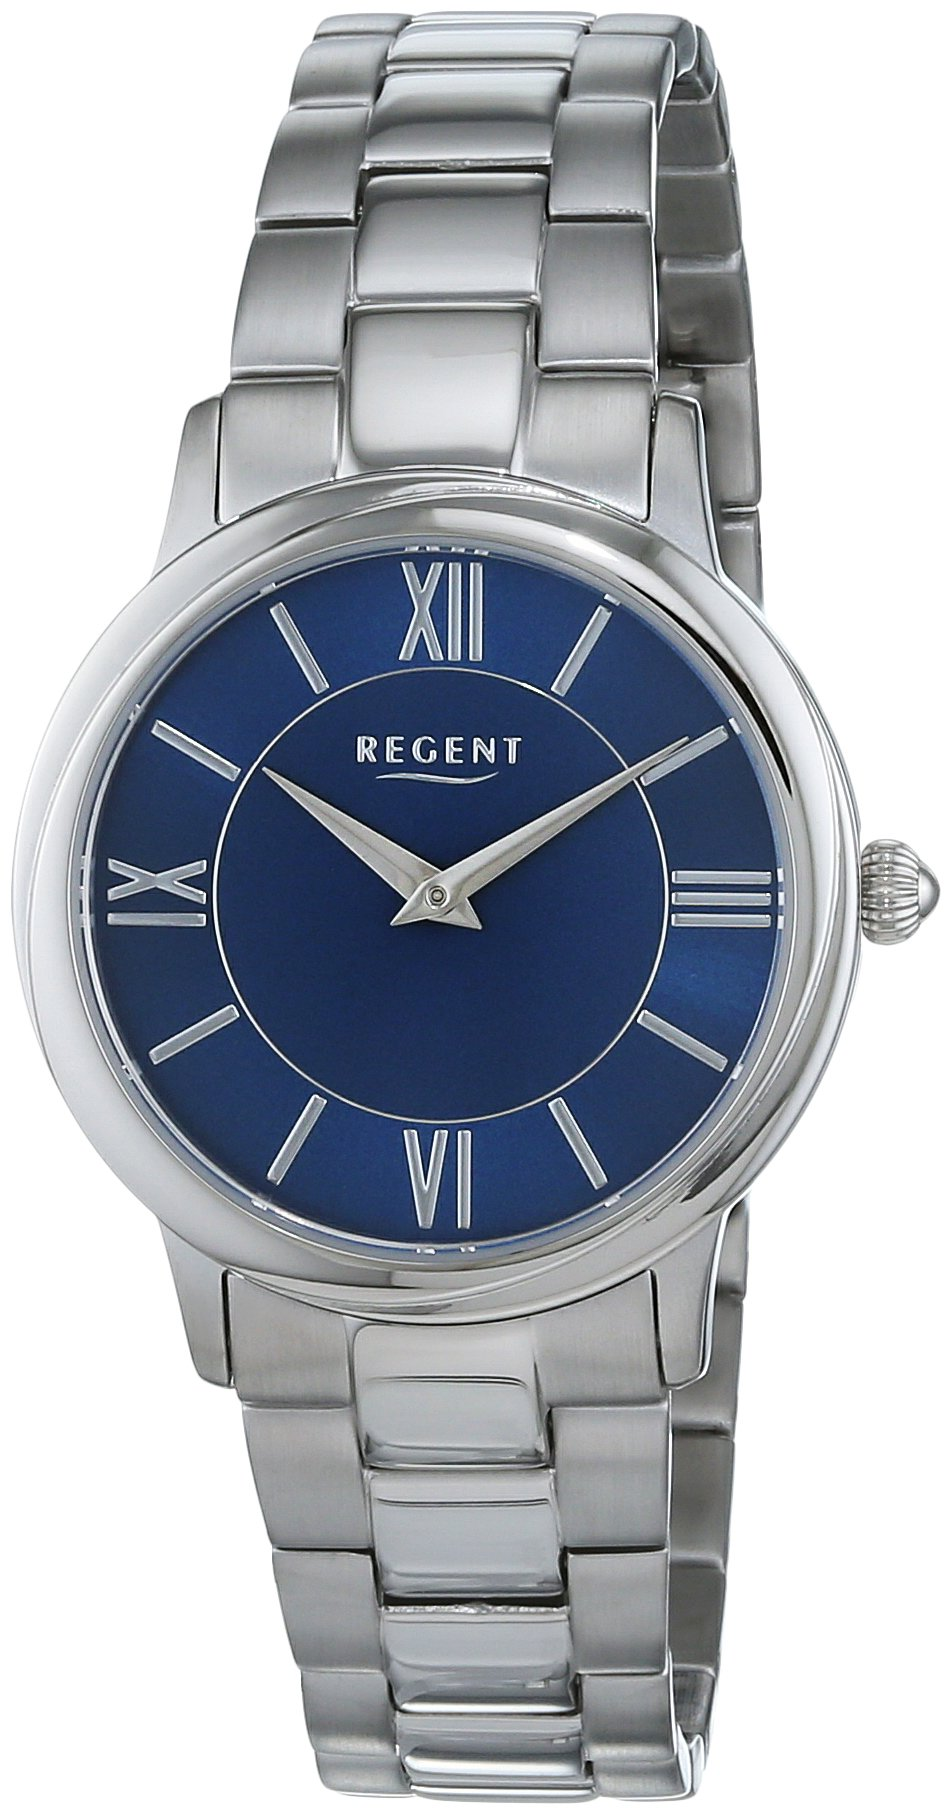 REGENT-Damen-Analog-Quarz-Uhr-mit-Edelstahl-Armband-12221038